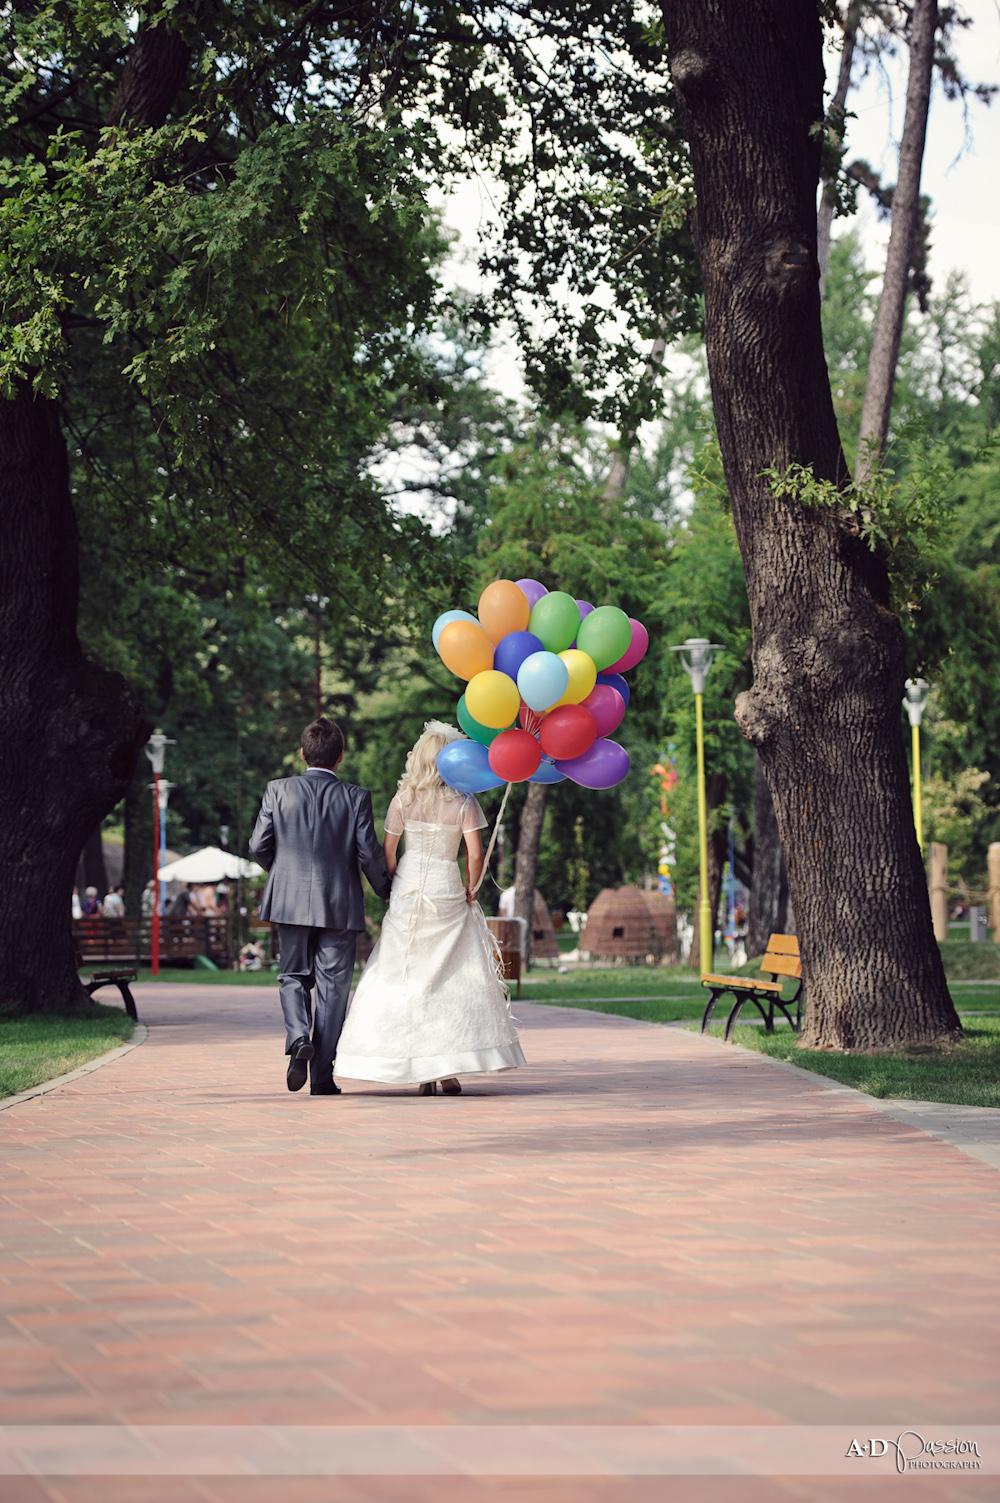 AD Passion Photography | 20120905_fotograf-profesionist-nunta-timisoara_anastasiia-si-sergiu-nunta_0043 | Adelin, Dida, fotograf profesionist, fotograf de nunta, fotografie de nunta, fotograf Timisoara, fotograf Craiova, fotograf Bucuresti, fotograf Arad, nunta Timisoara, nunta Arad, nunta Bucuresti, nunta Craiova